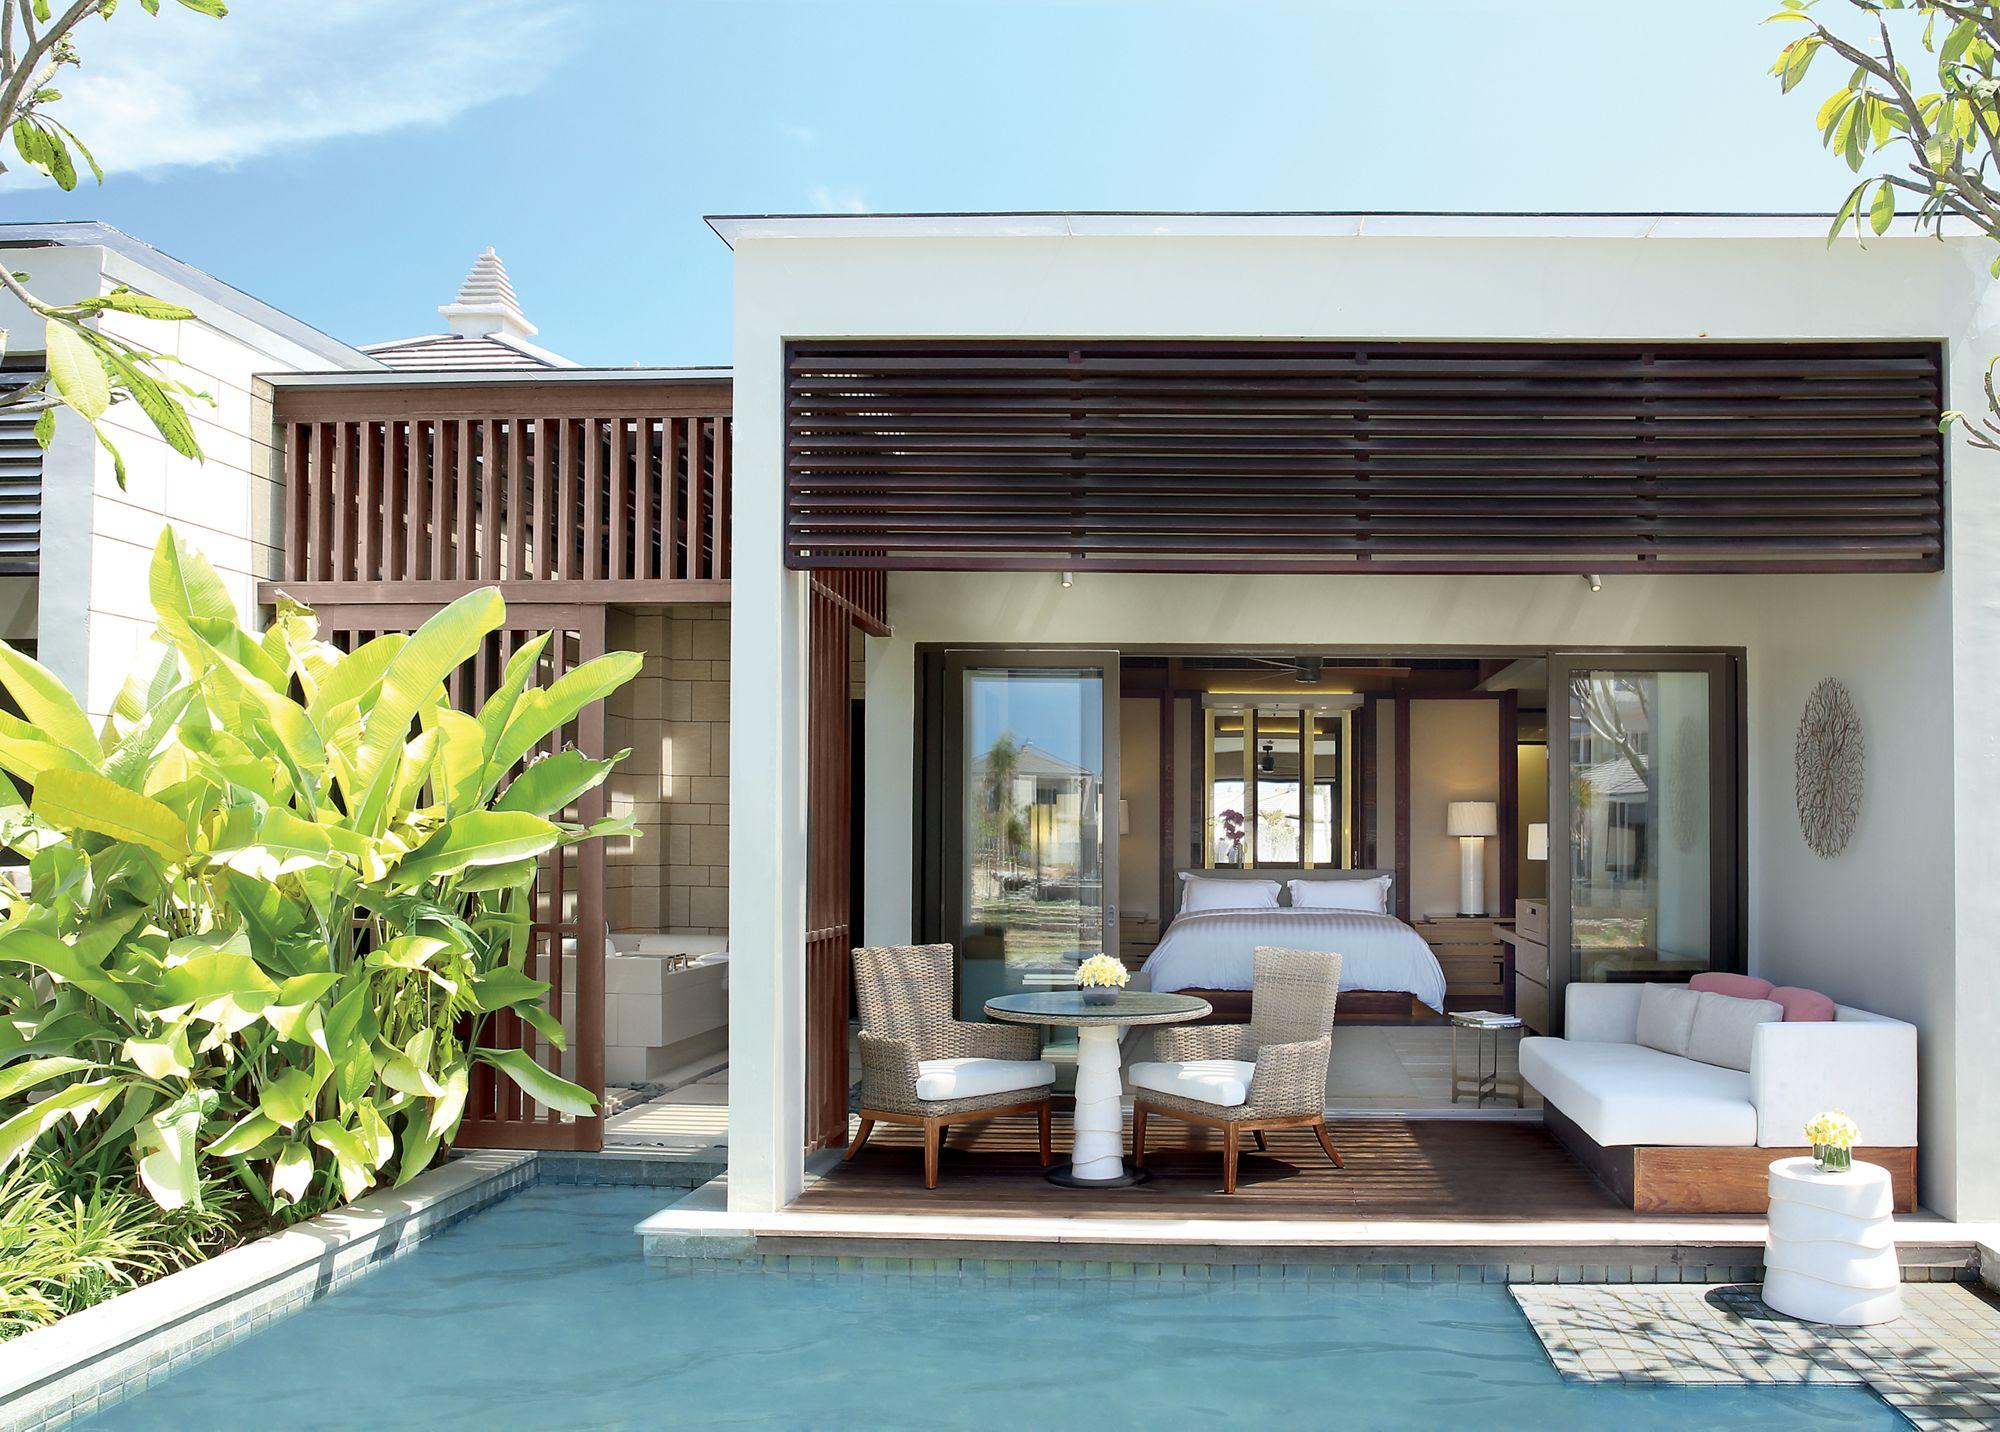 Indonesia Hotels Resorts